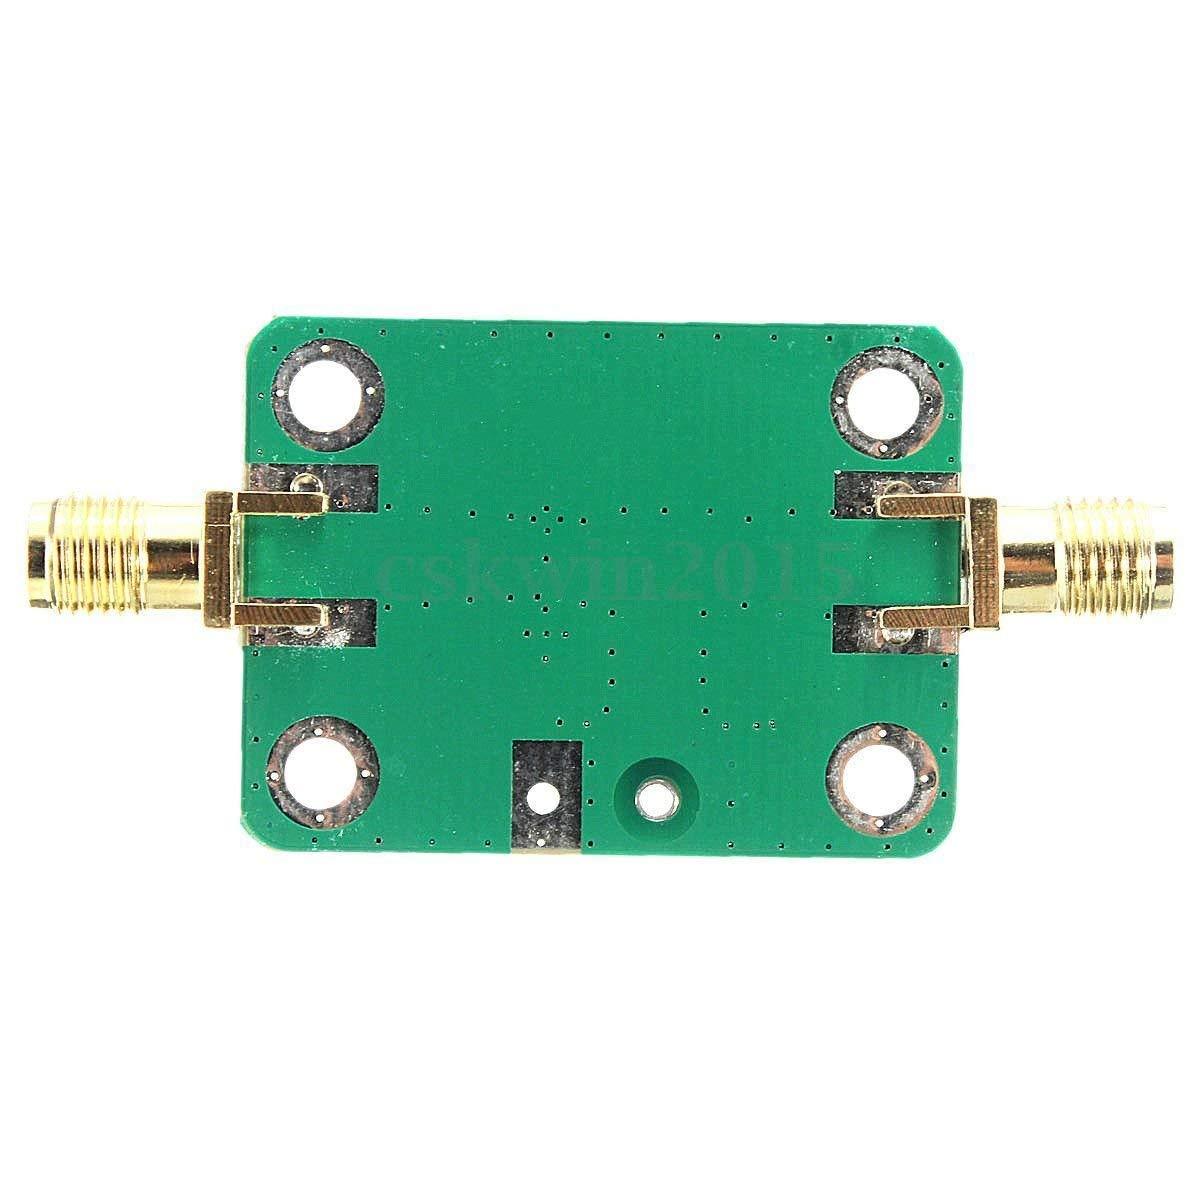 0.1-2000MHz RF WideBand Amplifier 30dB High Gain Low Noise LNA Amplifier